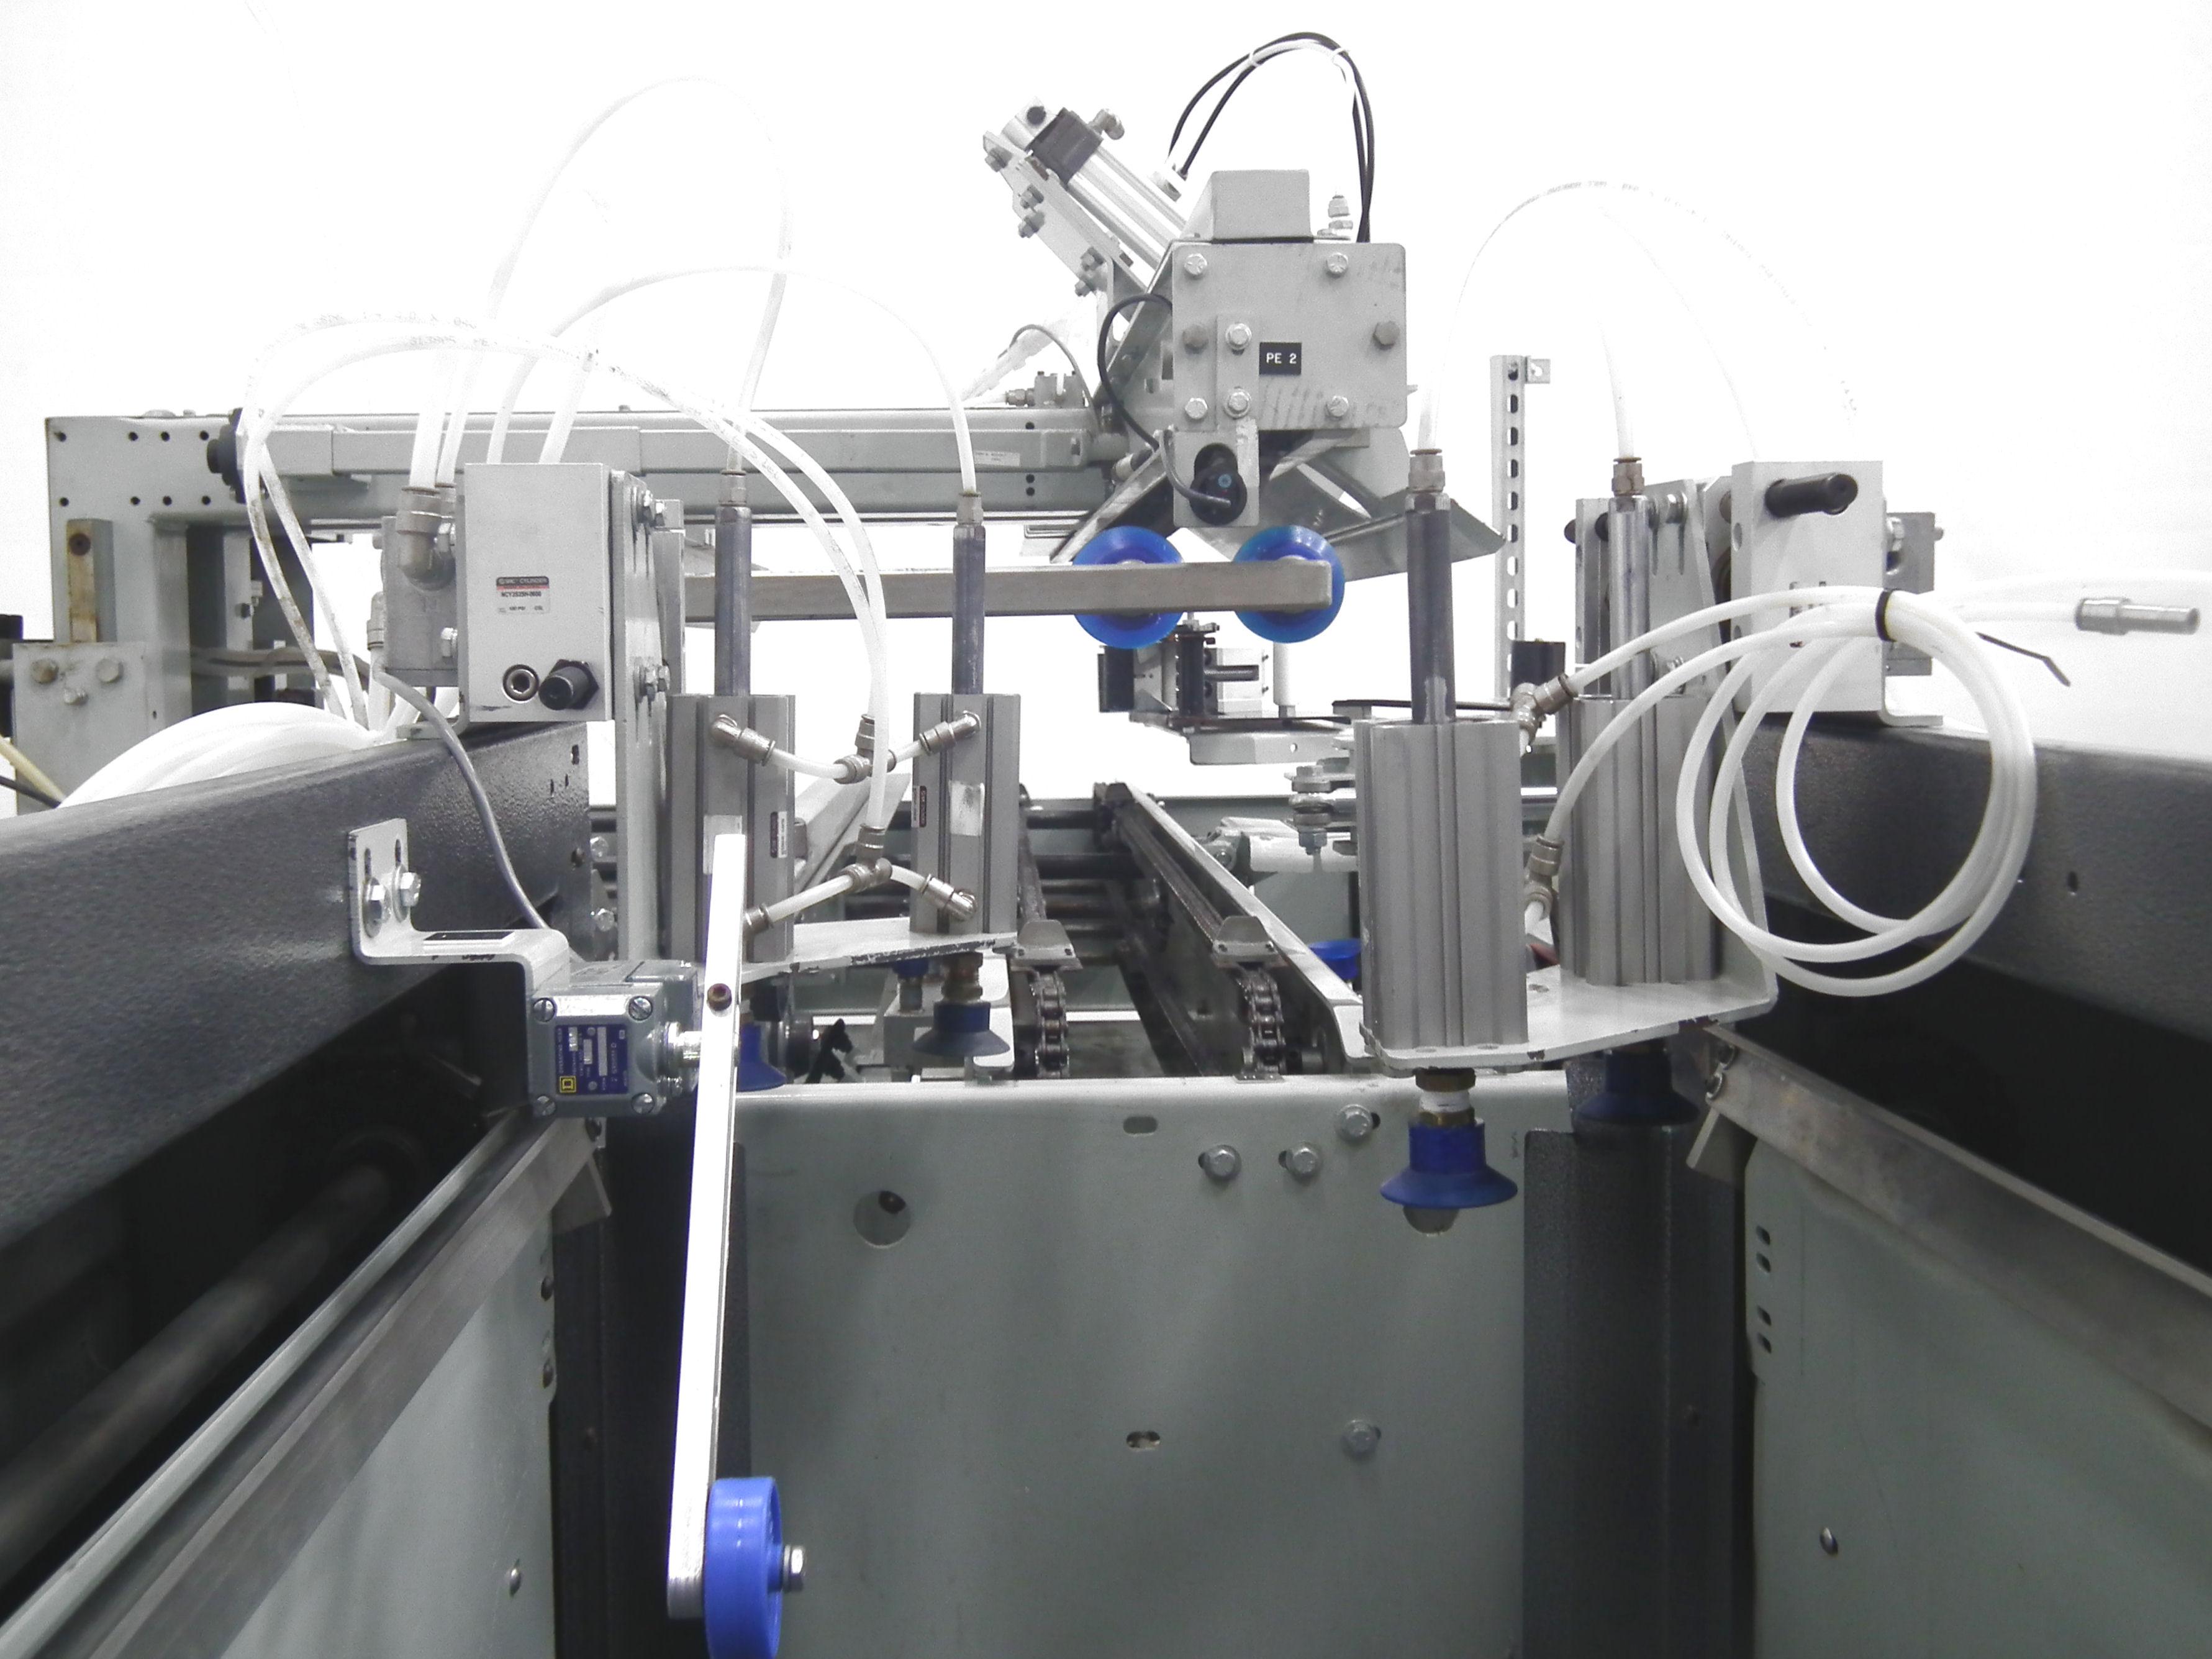 Marq Tuff HPE-NS-MF/RH/DL Bottom Tape Case Erector A9697 - Image 5 of 15